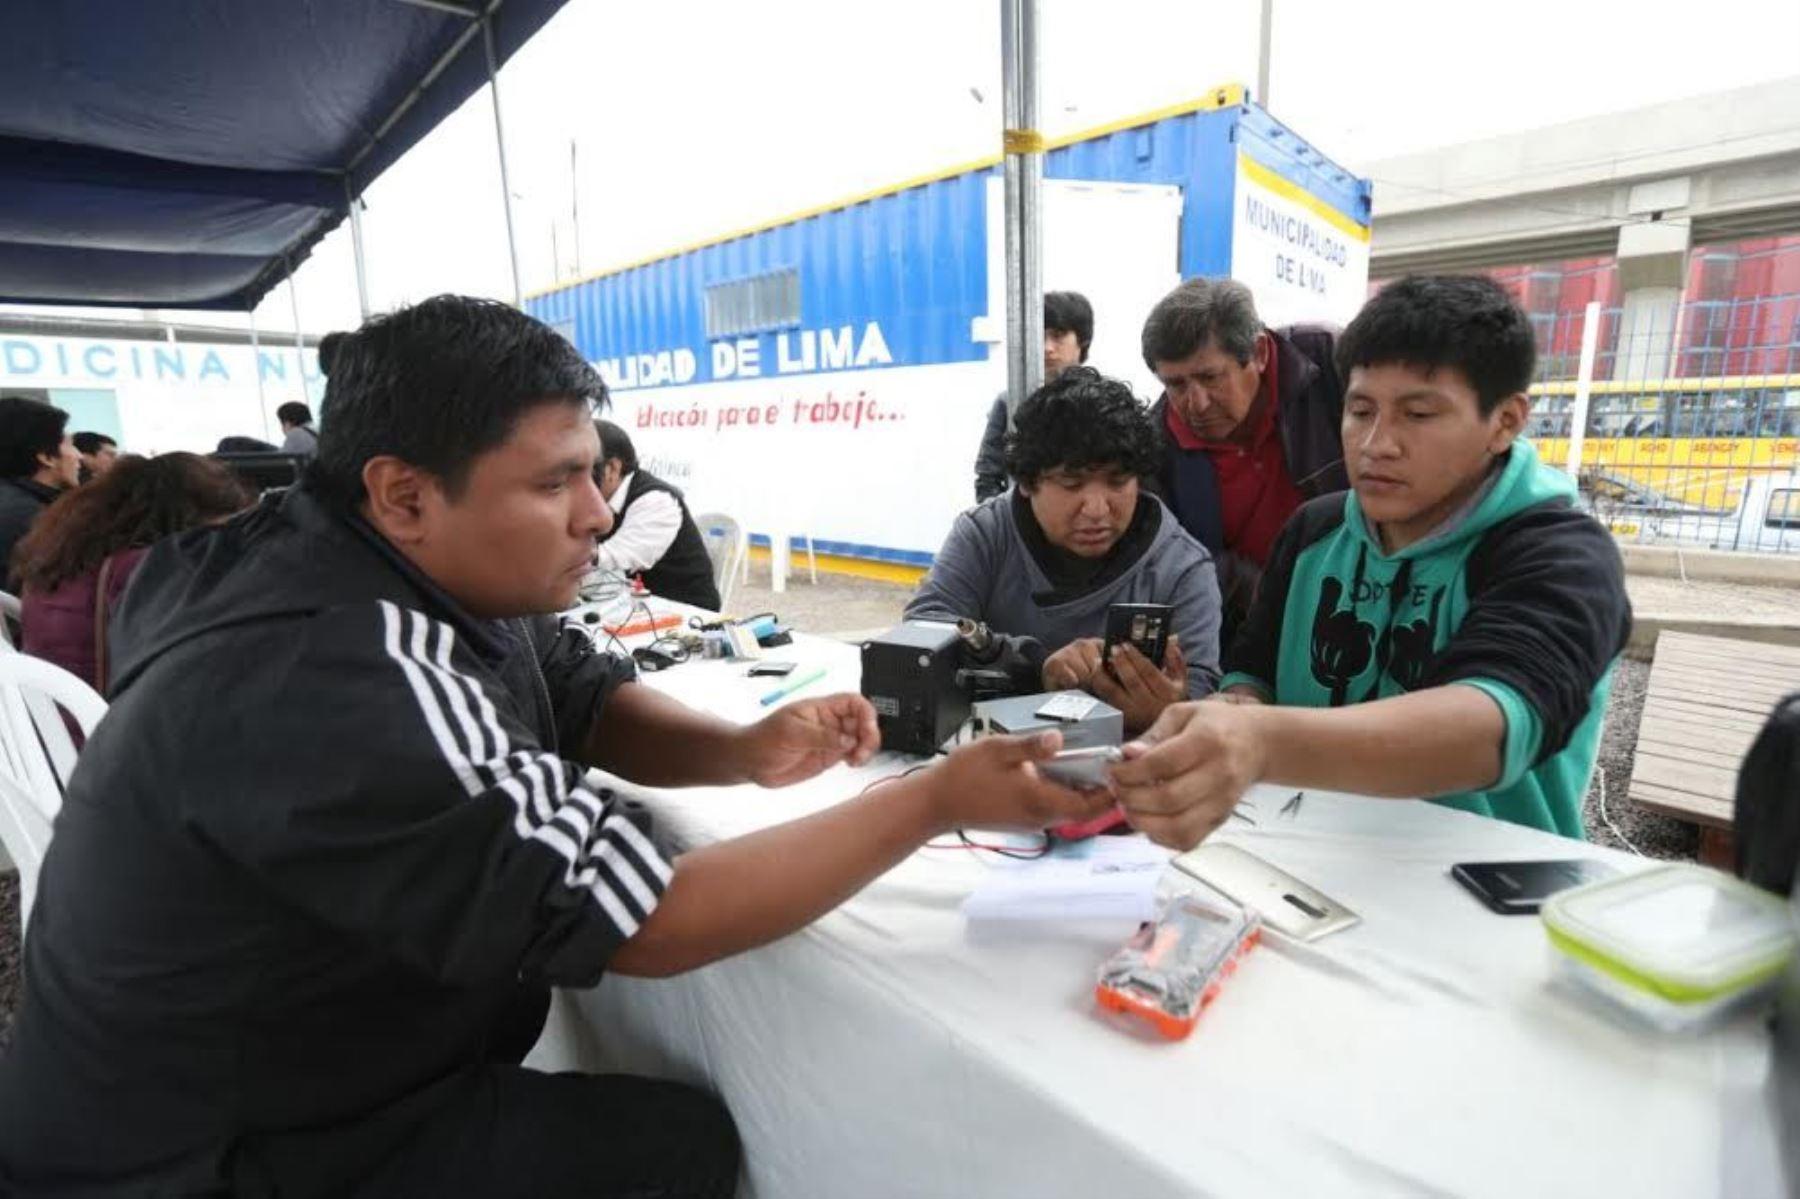 Reparación de celulares será gratuita. Foto: Difusión.